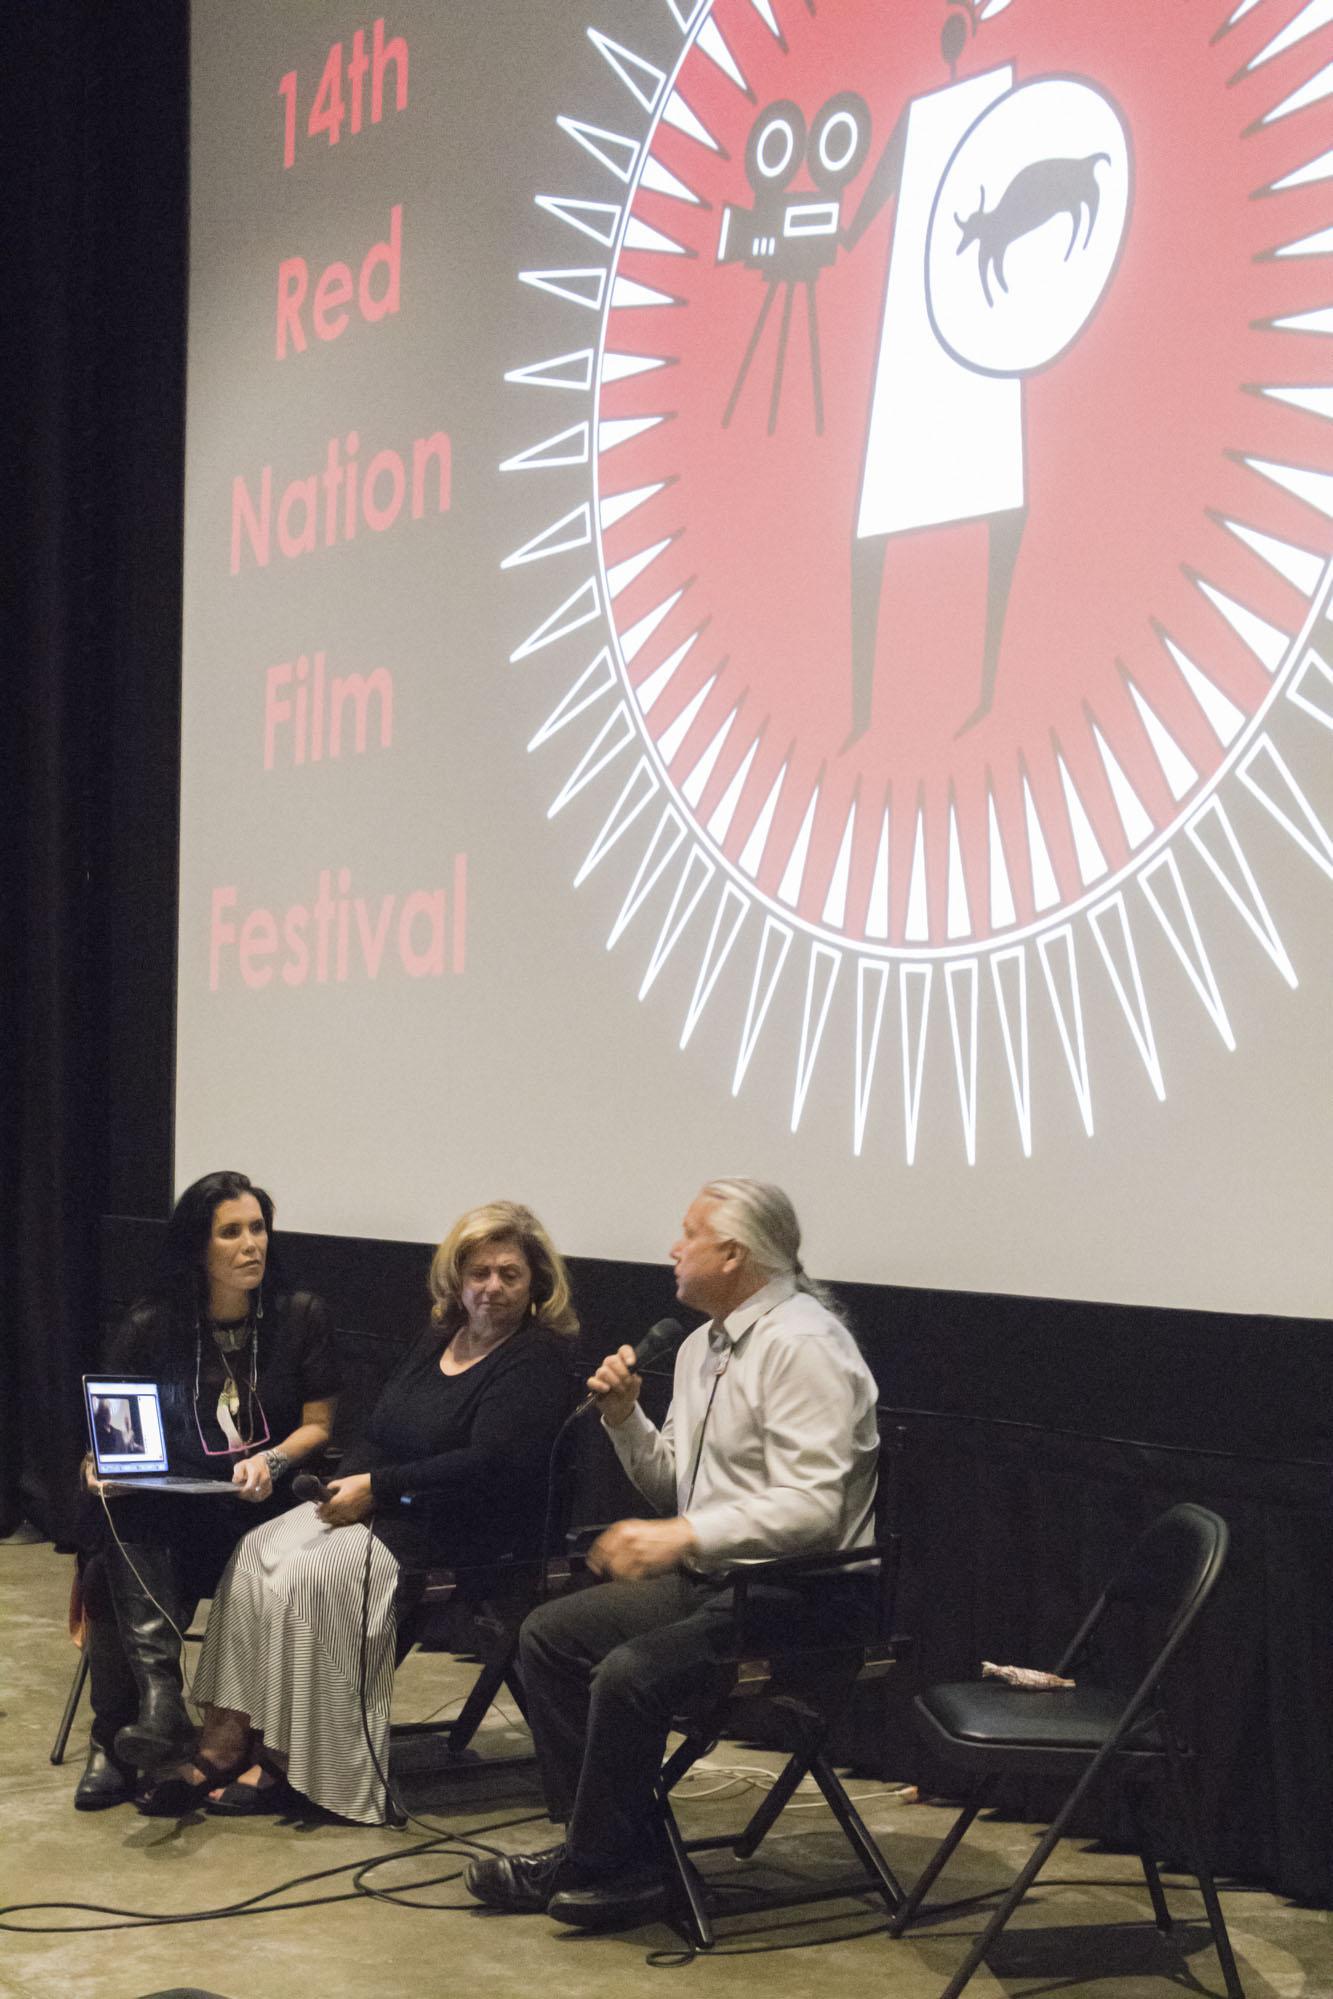 Red Nation Film Festival 2017 November 16, 2017 Laemmle, Santa Monica, CA. Photography by: Jesse Watrous Photography and Media Photographers: Jesse M. Watrous, Sam Moszkowicz